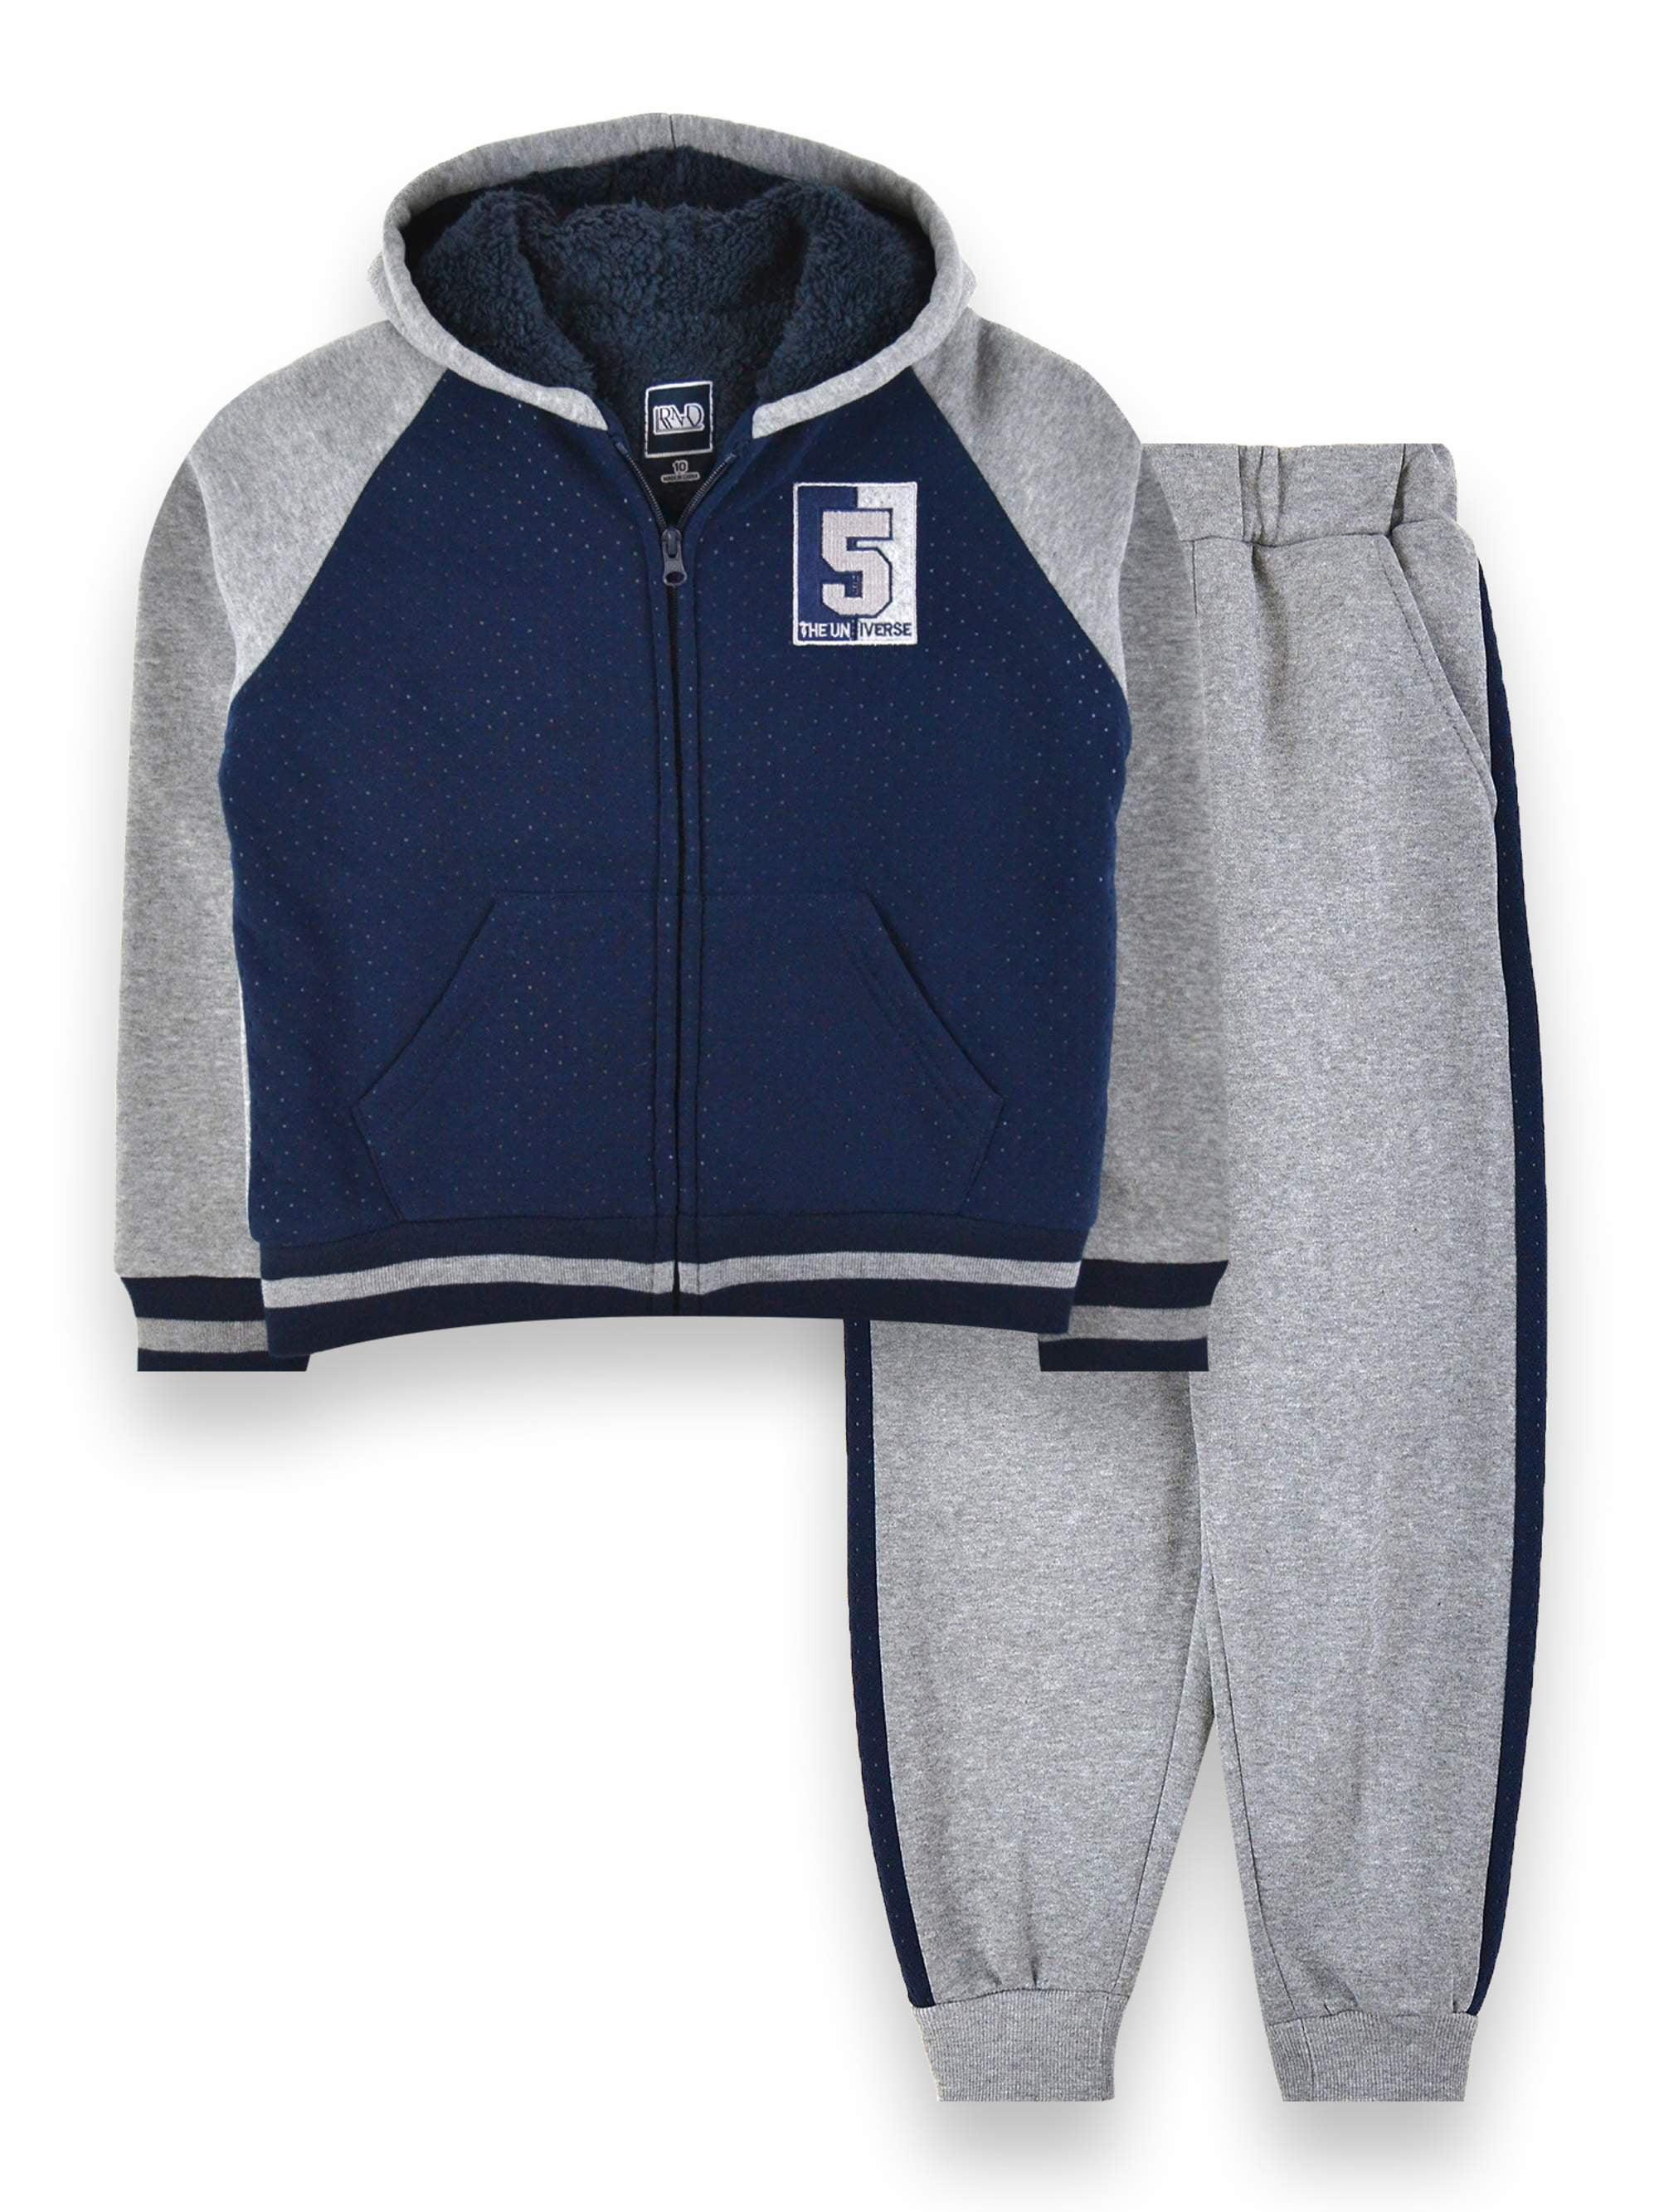 RND RND Boys 4 16 Sherpa Lined Zip Up Sweatshirt & Jogger Sweatpants, 2 Piece Outfit Set